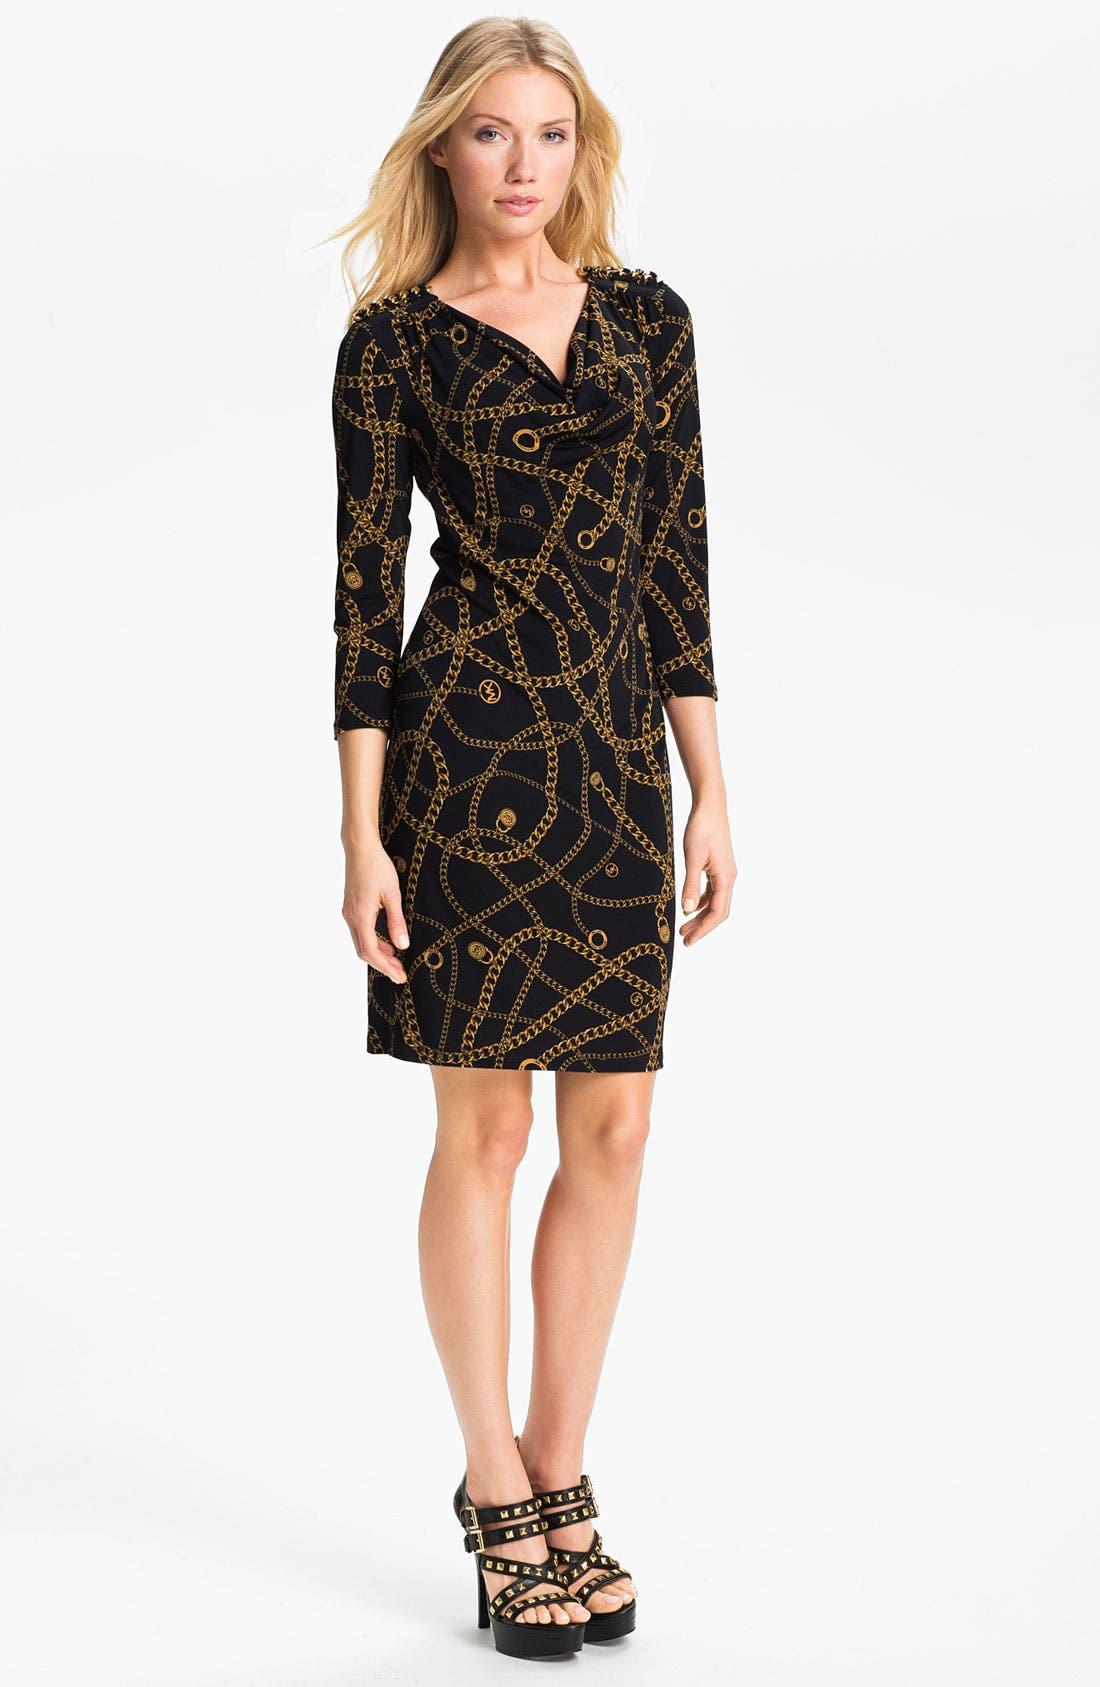 Main Image - MICHAEL Michael Kors 'Hamilton' Chain Print Dress (Petite)